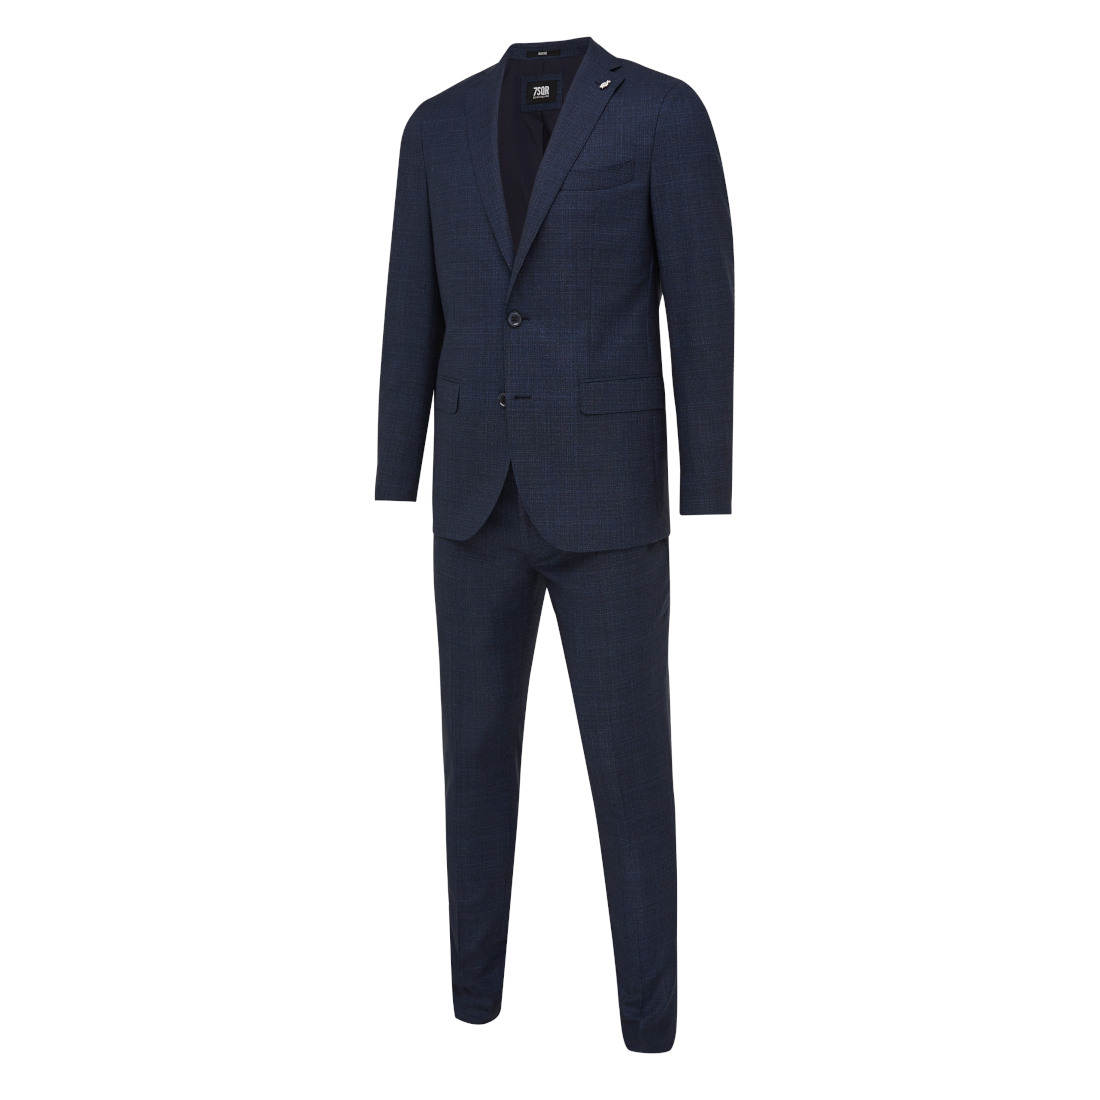 Smit Mode:  7Square kostuum 22001802 223047 in het Blauw